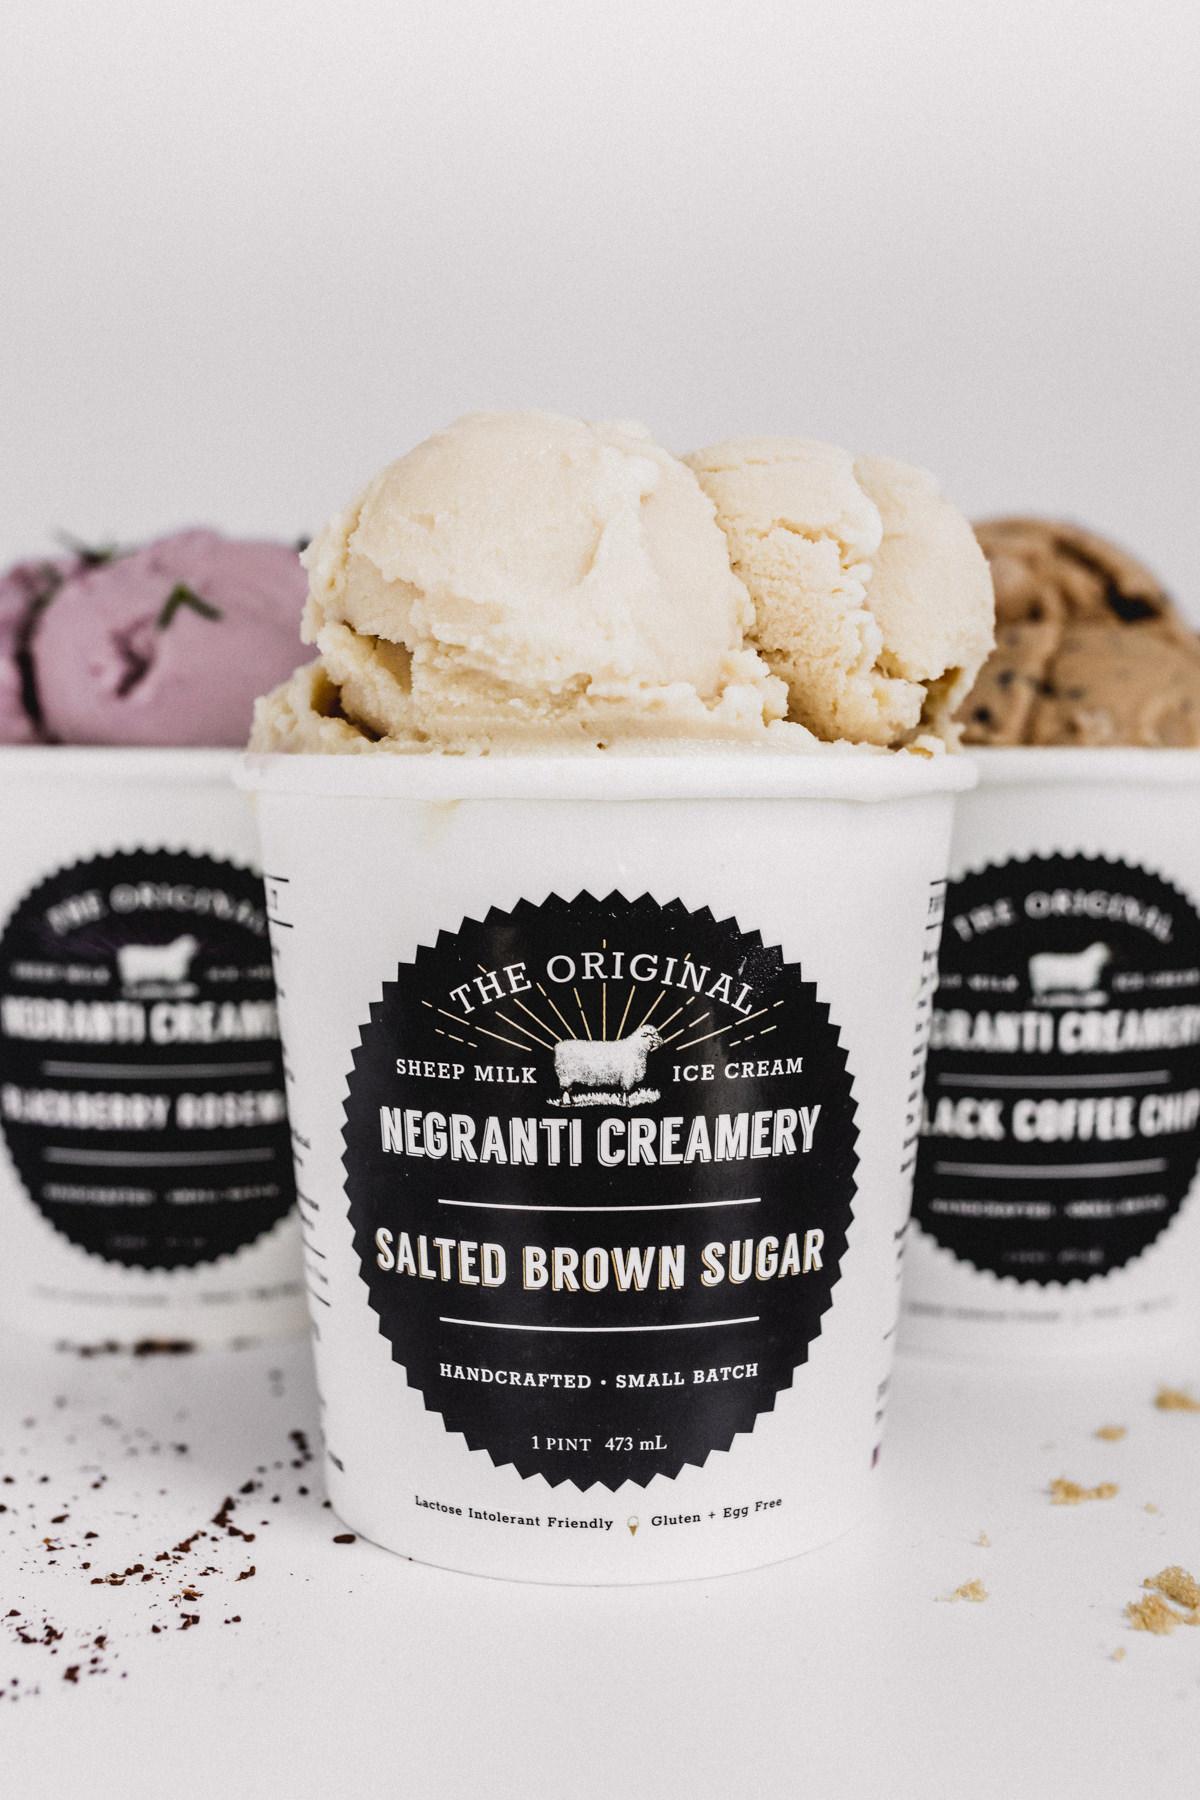 Product-Photography-Negranti-Creamery-Paso-Robles-California-805-Media-16.jpg